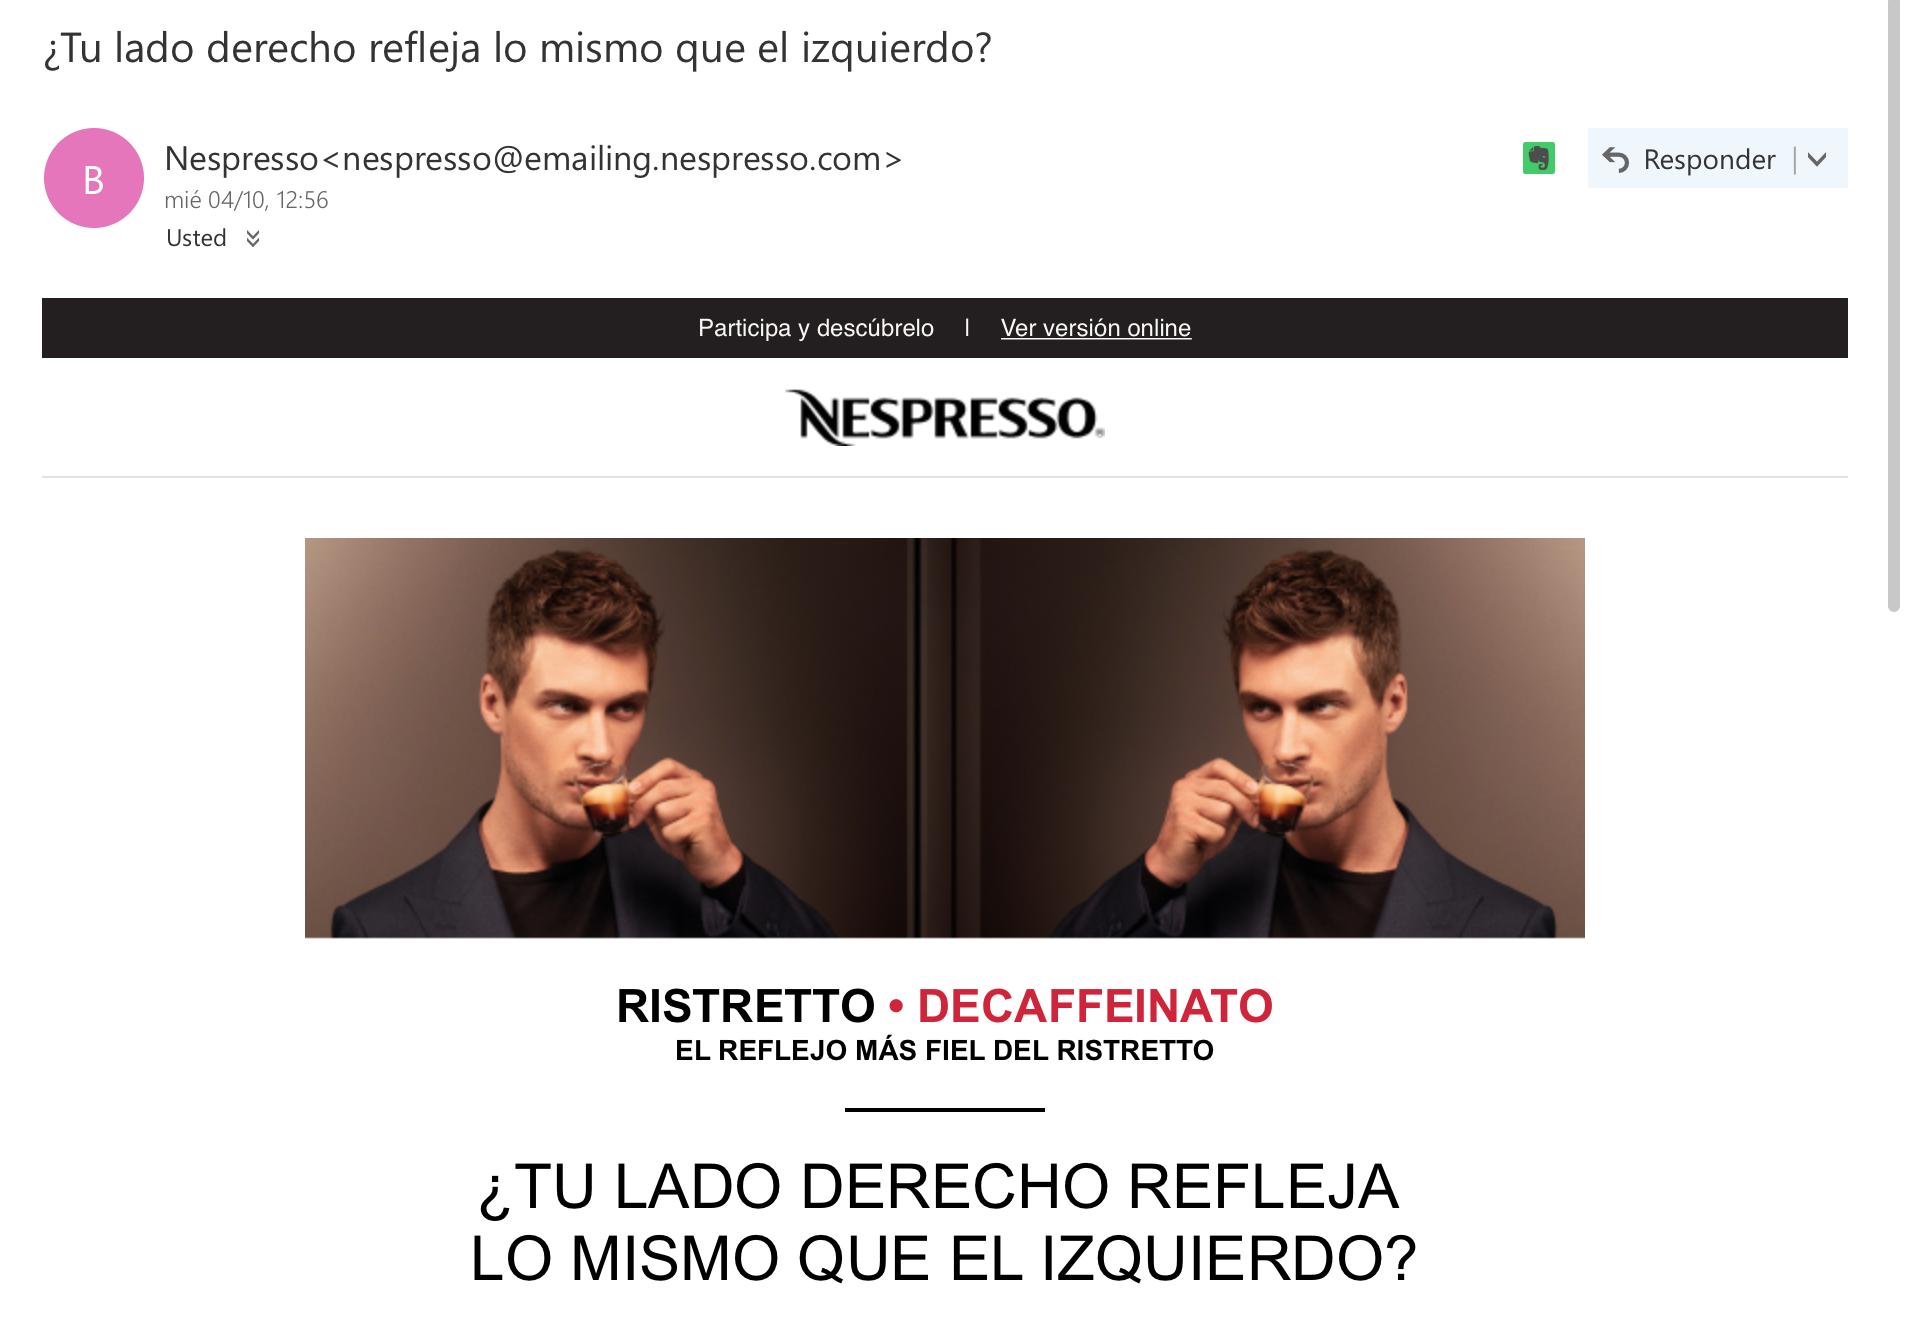 ejemplos de asuntos de email: Nespresso